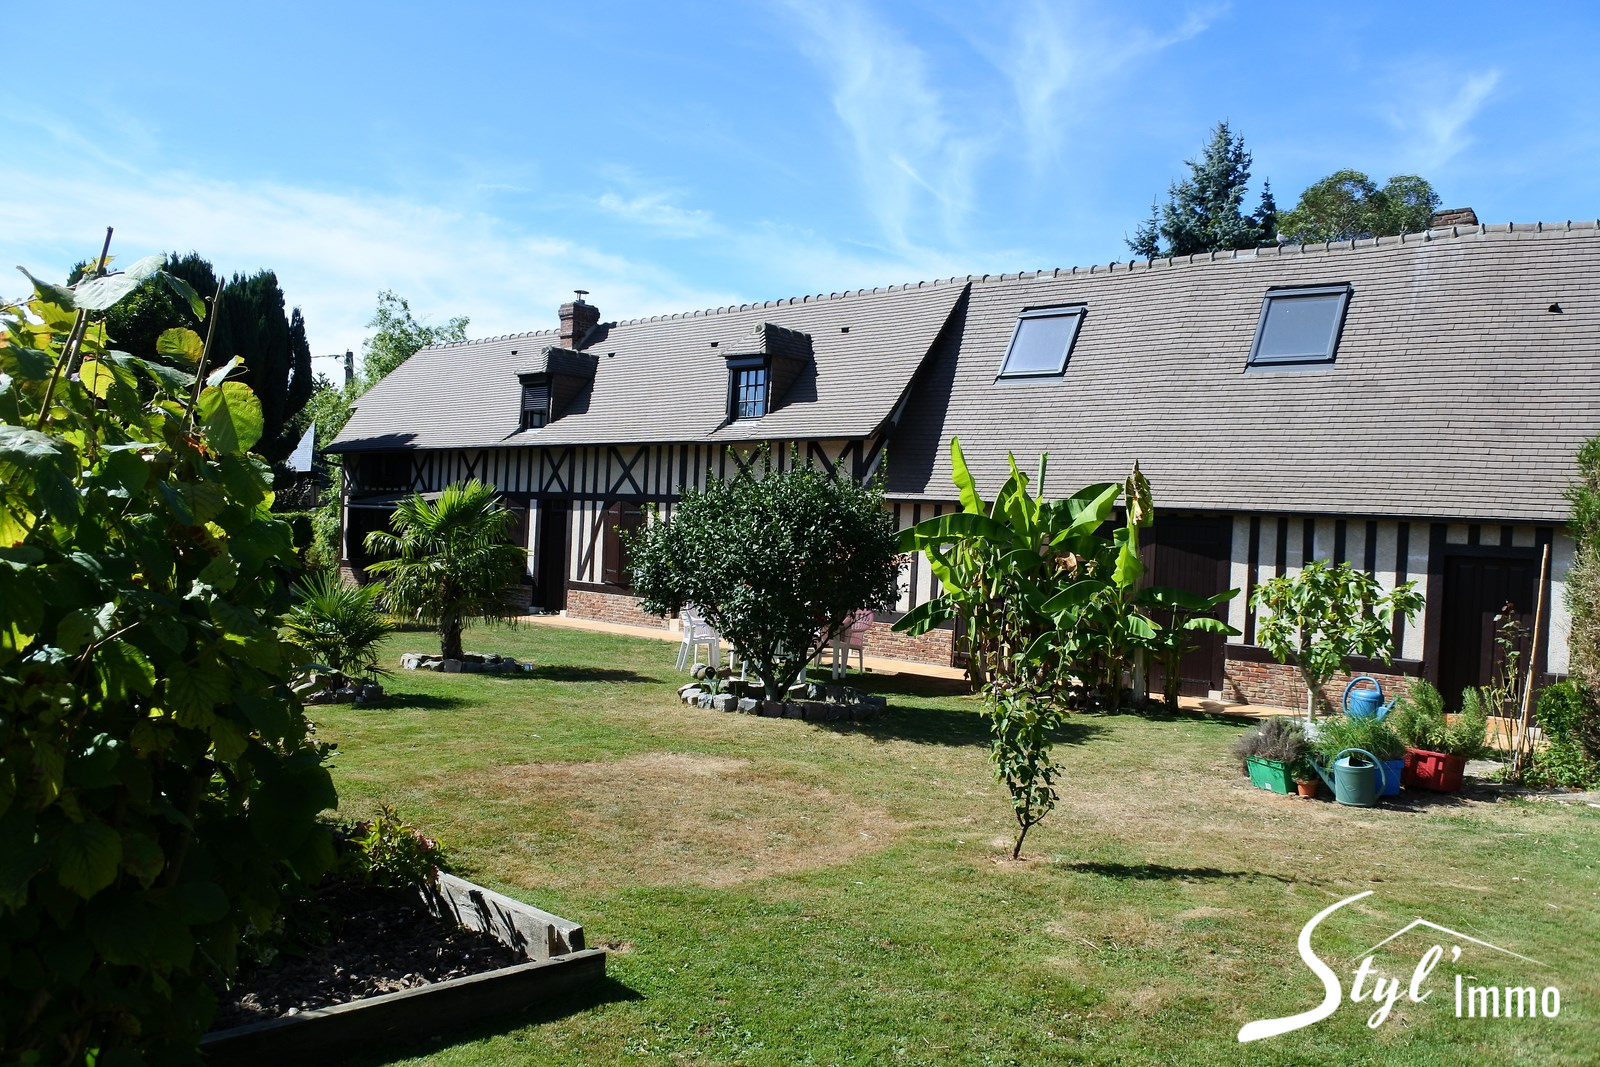 Annonce vente maison le neubourg 27110 160 m 243 000 for Piscine neubourg